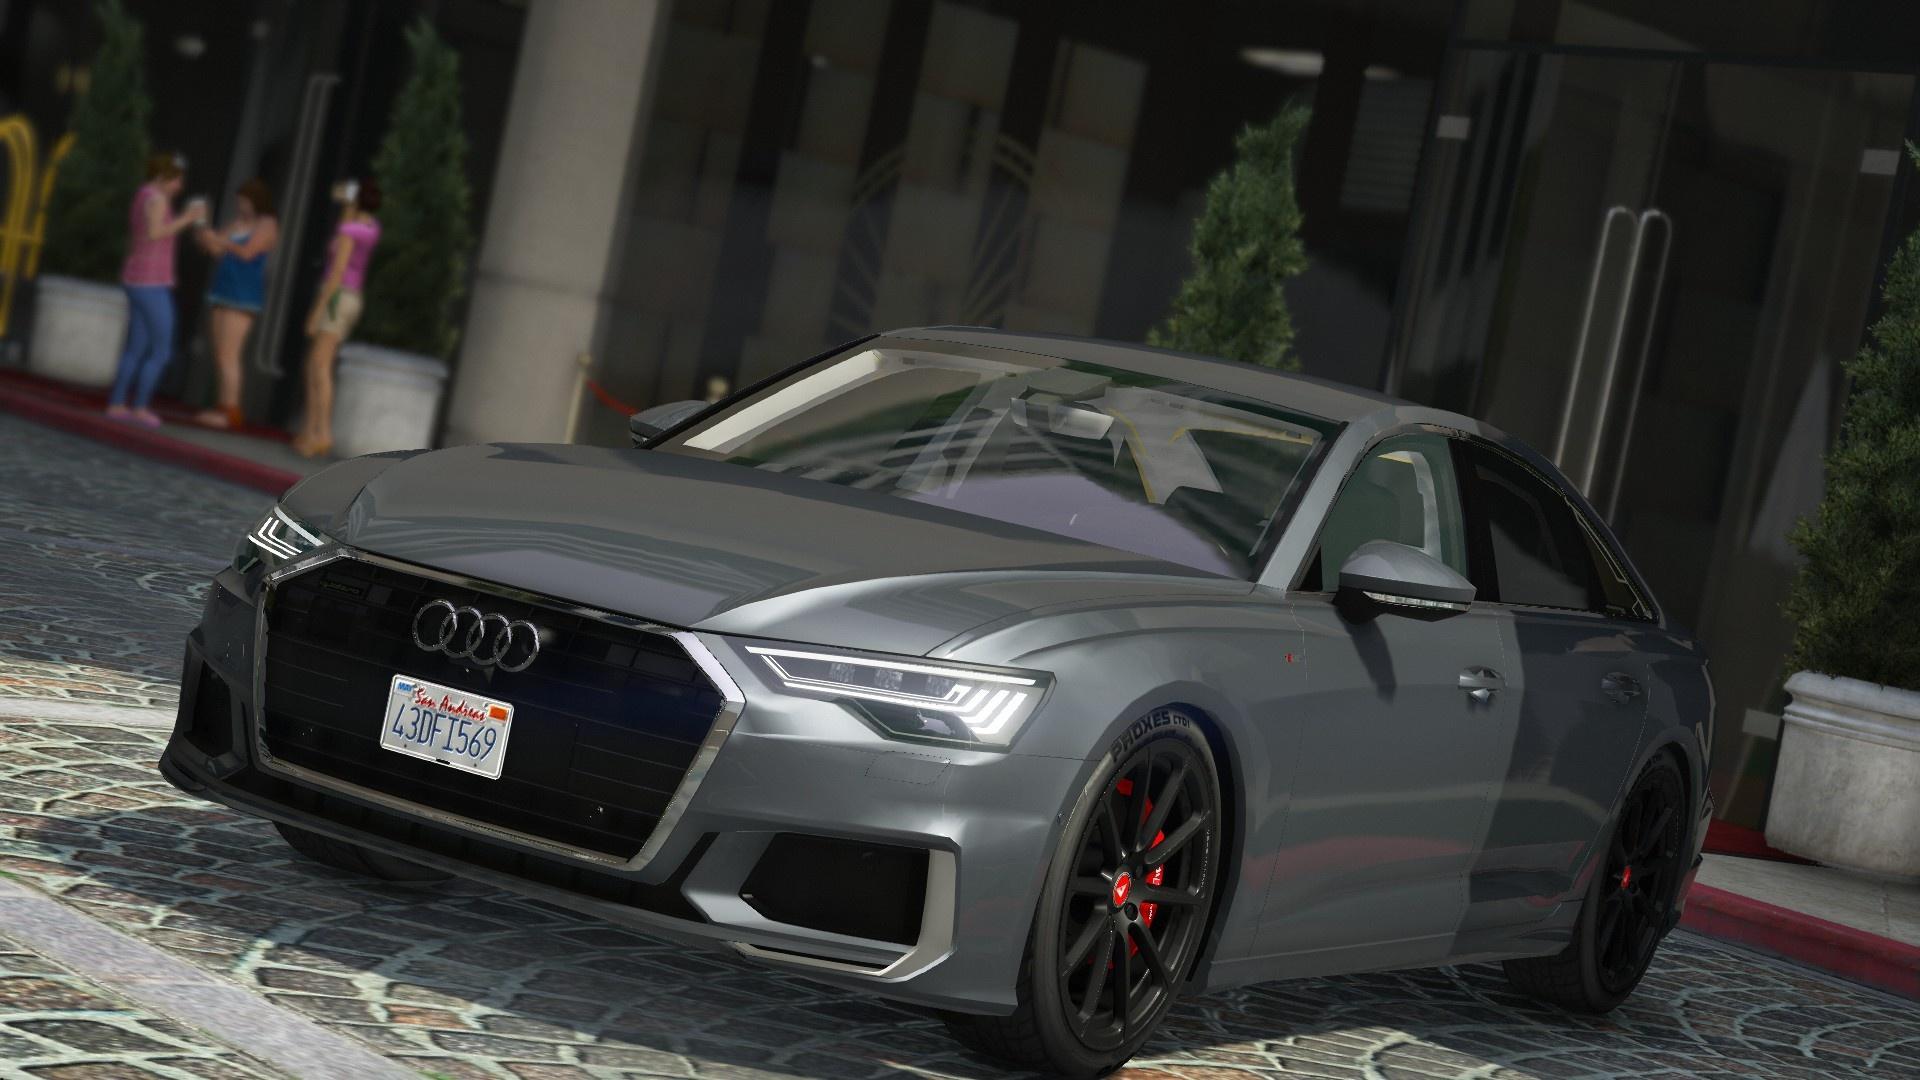 2019 Audi A6 55 Tfsi Quattro S Line 10 Gamesmodsnet Fs19 Fs17